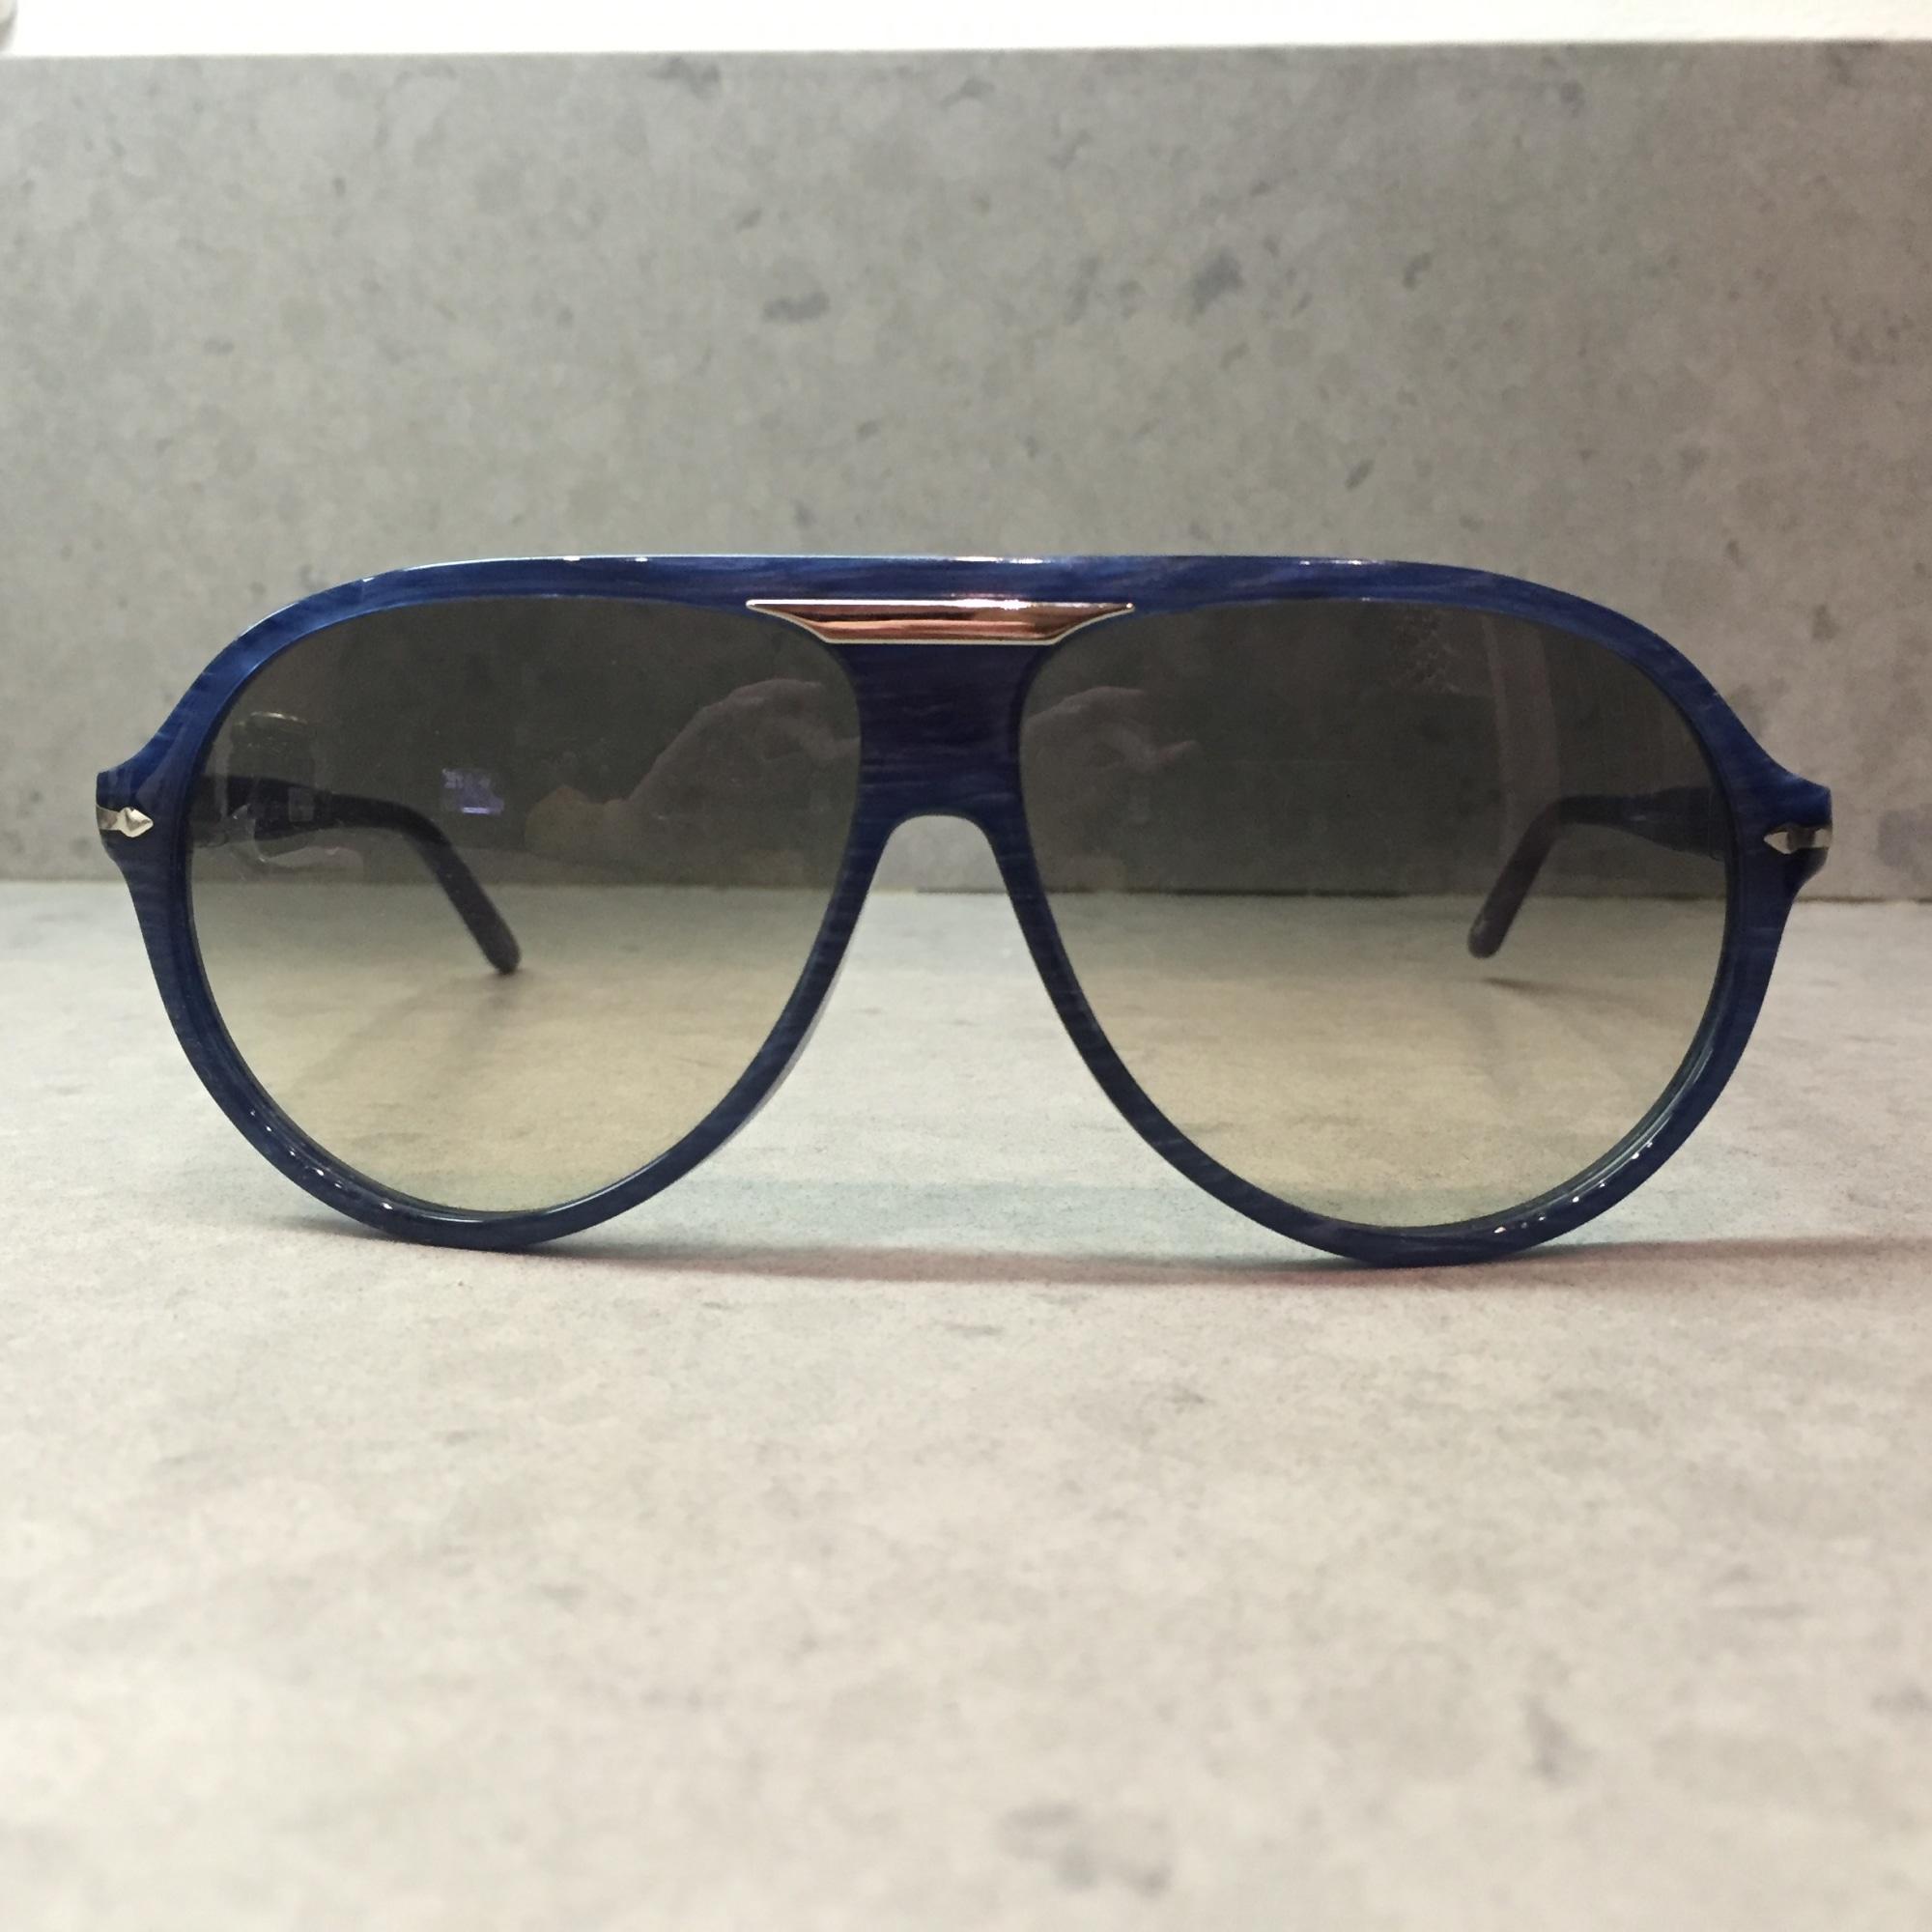 Lunettes de soleil PERSOL Bleu, bleu marine, bleu turquoise d4d8c36355f2